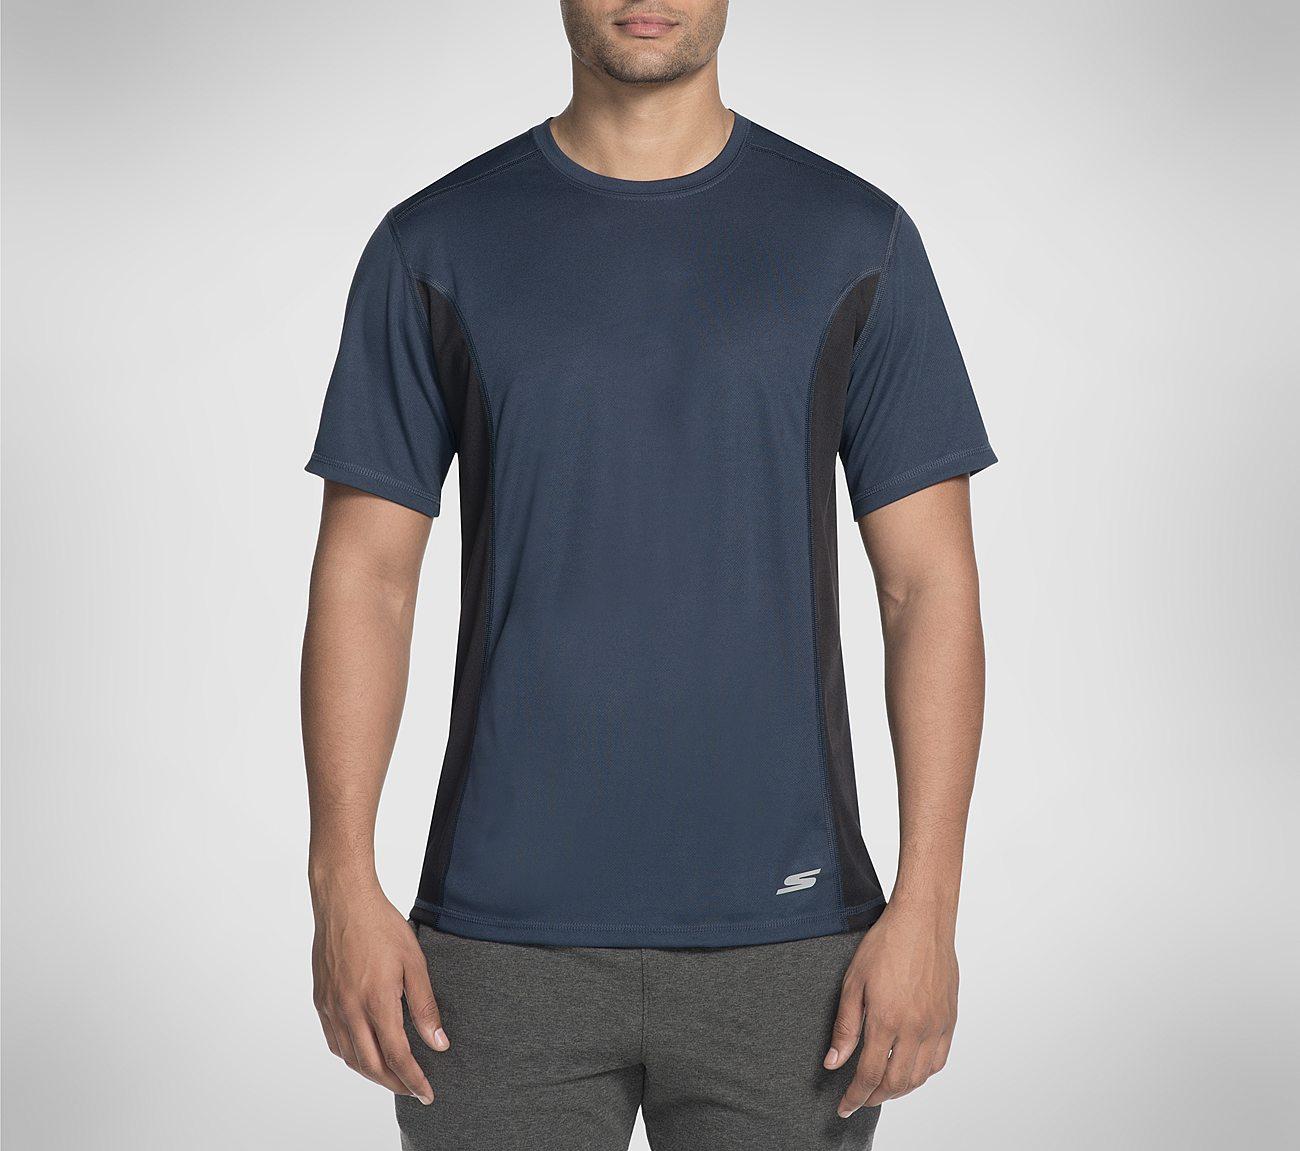 Dash 5k Tee Shirt